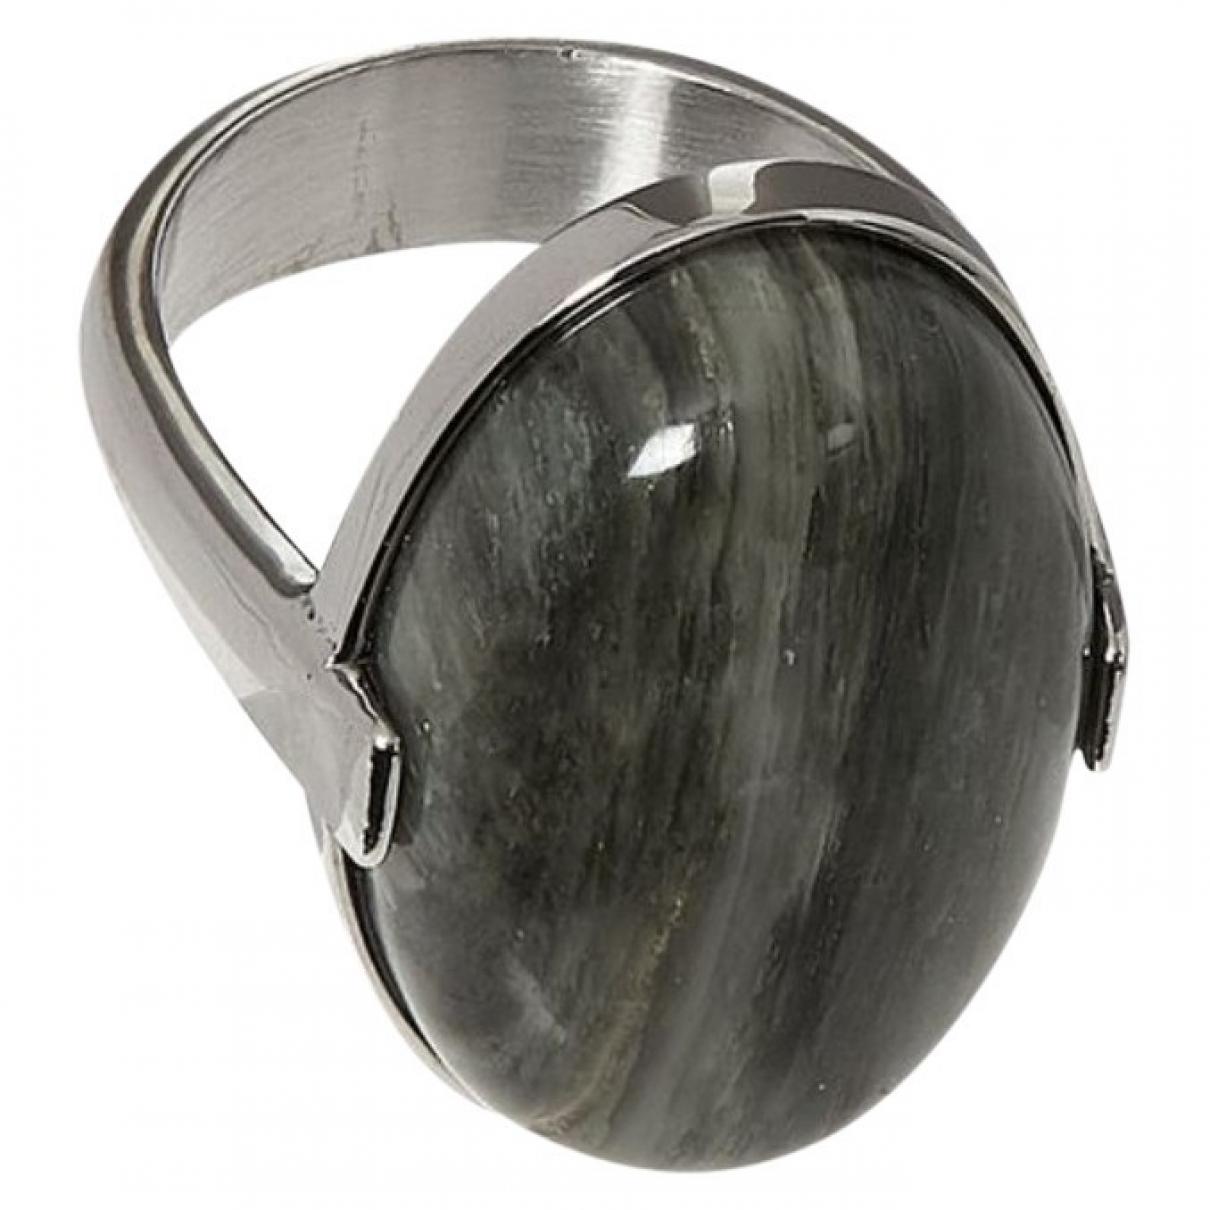 Dyrberg/kern \N Ring in  Grau Metall